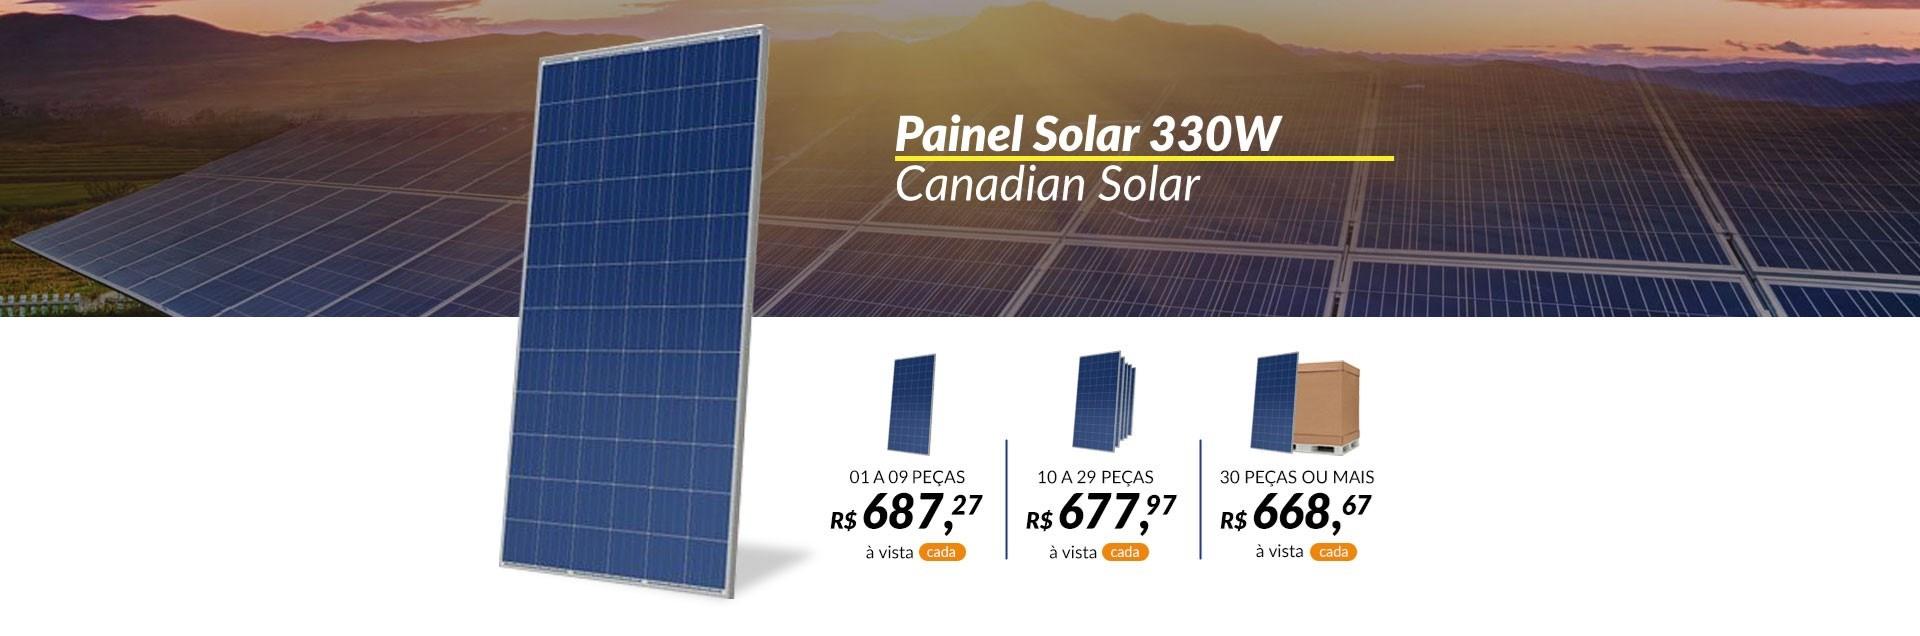 Painel Solar 330W Canadian